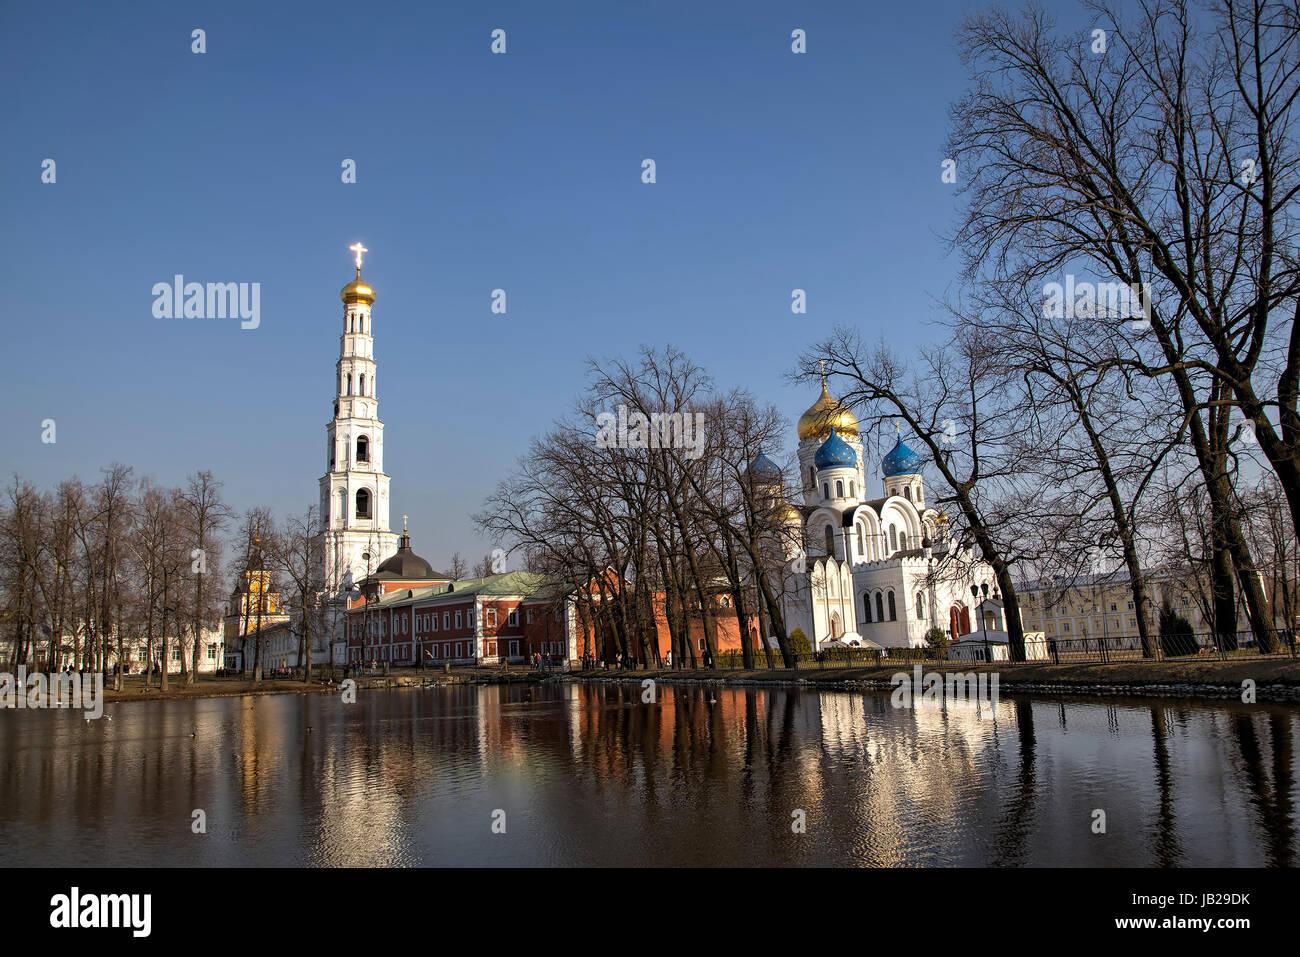 St. Nicholas Ugreshsky (Nikolo-Ugreshsky) monastery at Dzerzhinsky, Moscow region, Russia - Stock Image